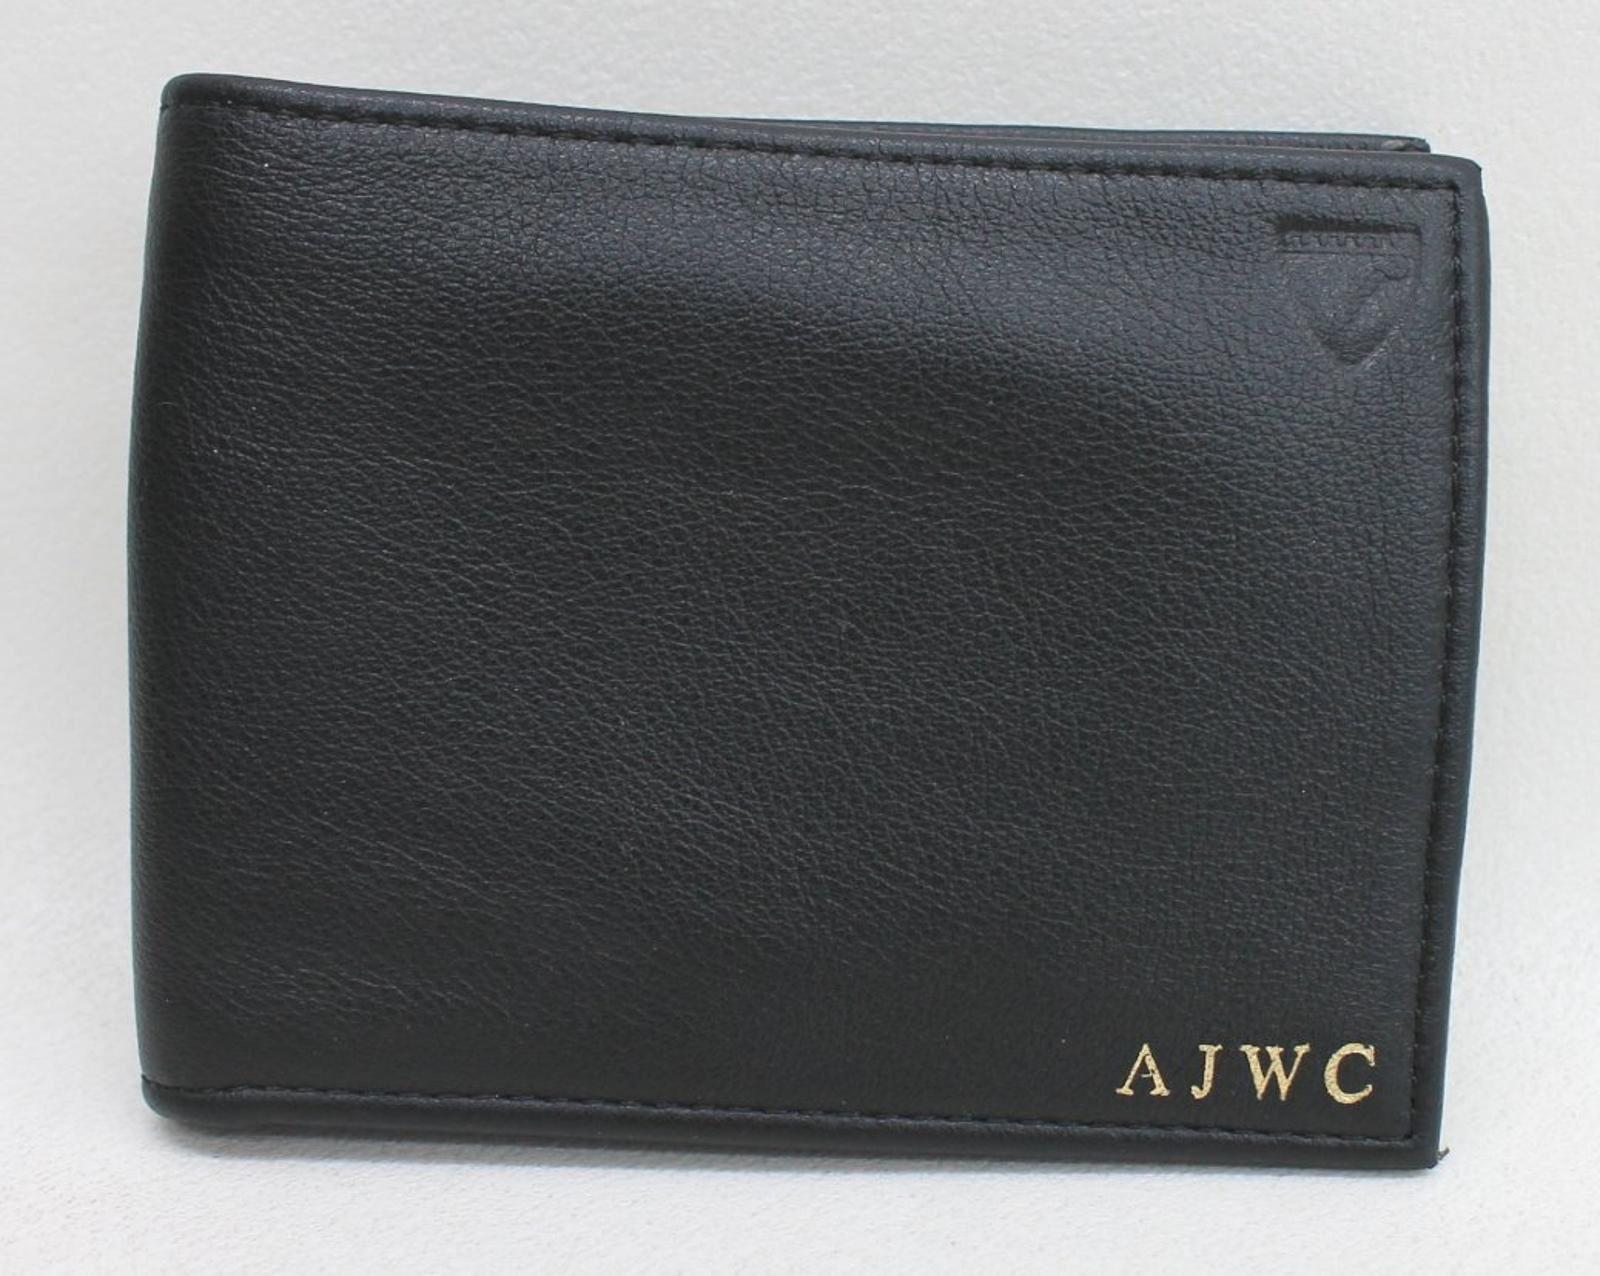 2019 Mode Aspinal Of London Men's Black 8 Card Billfold Leather Wallet Embossed Ajwc New KöStlich Im Geschmack